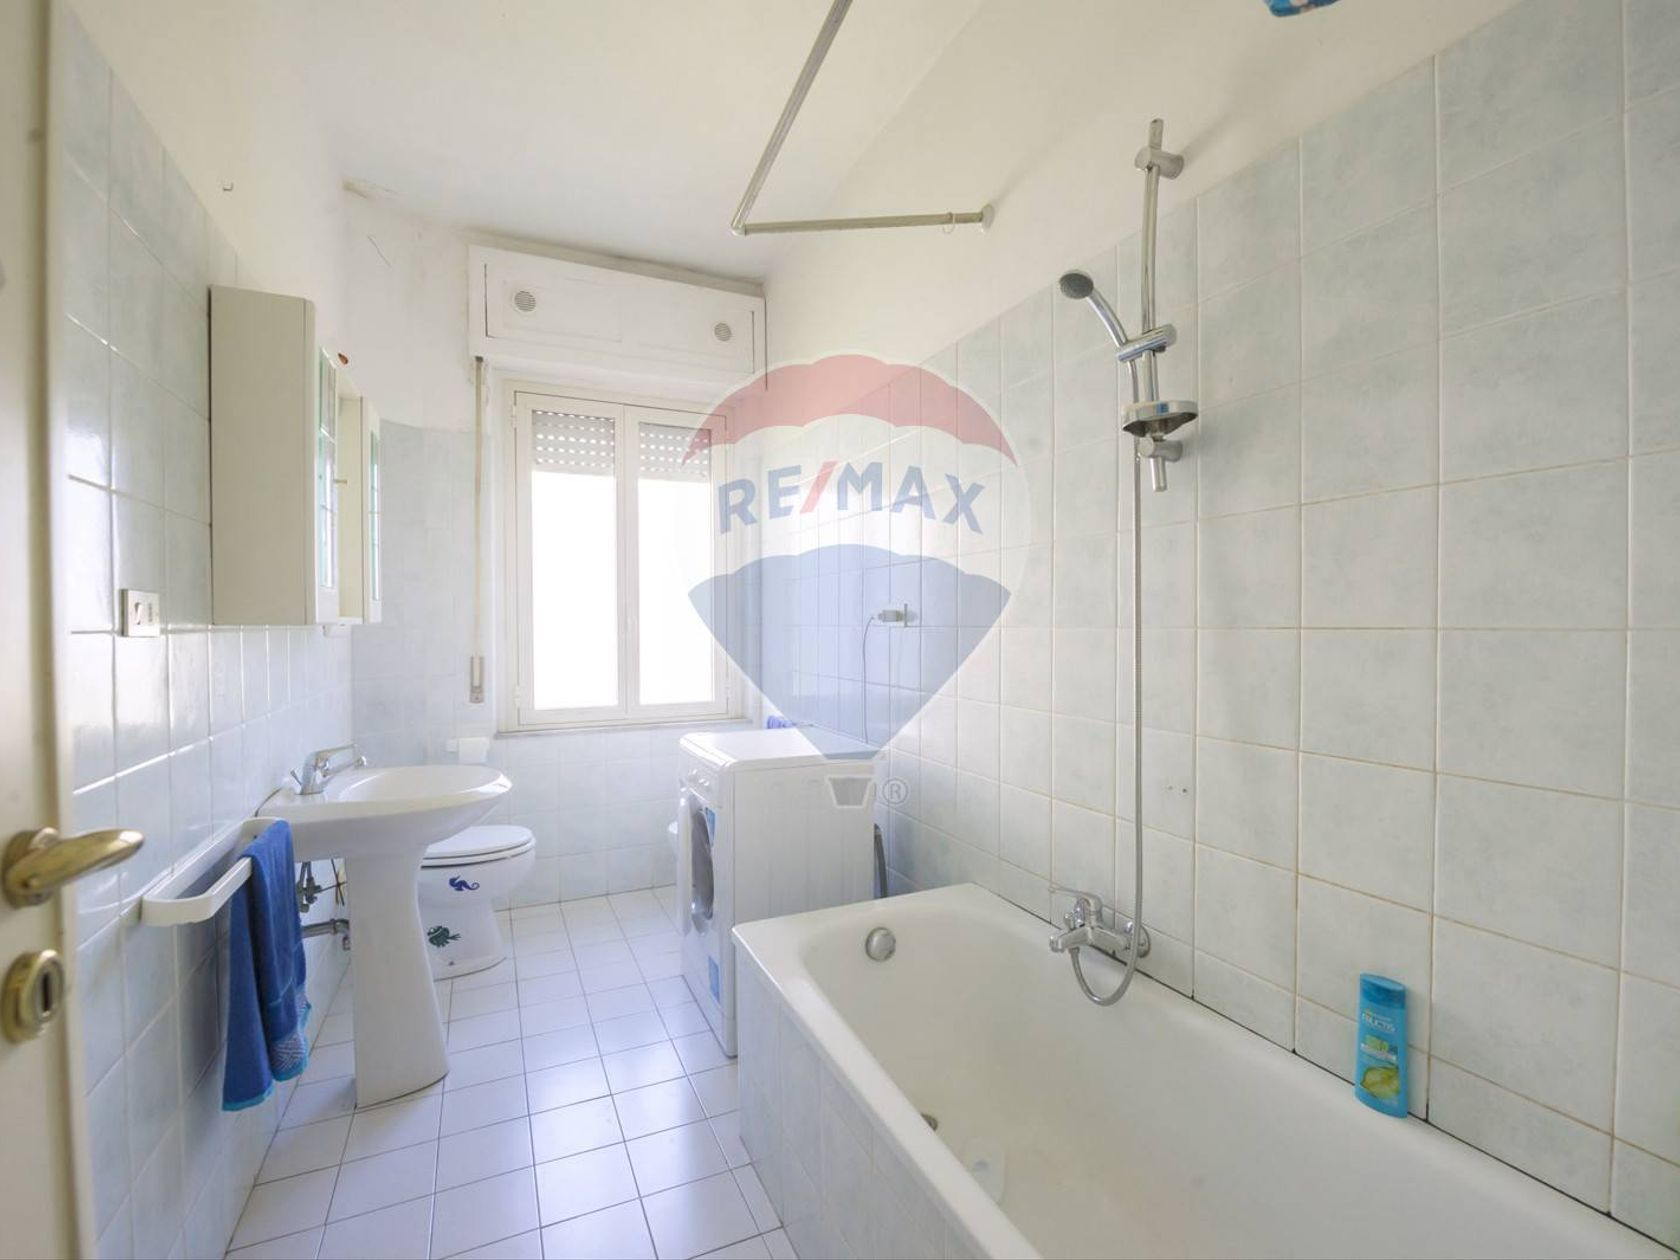 Appartamento Porta Nuova, Pescara, PE Vendita - Foto 15